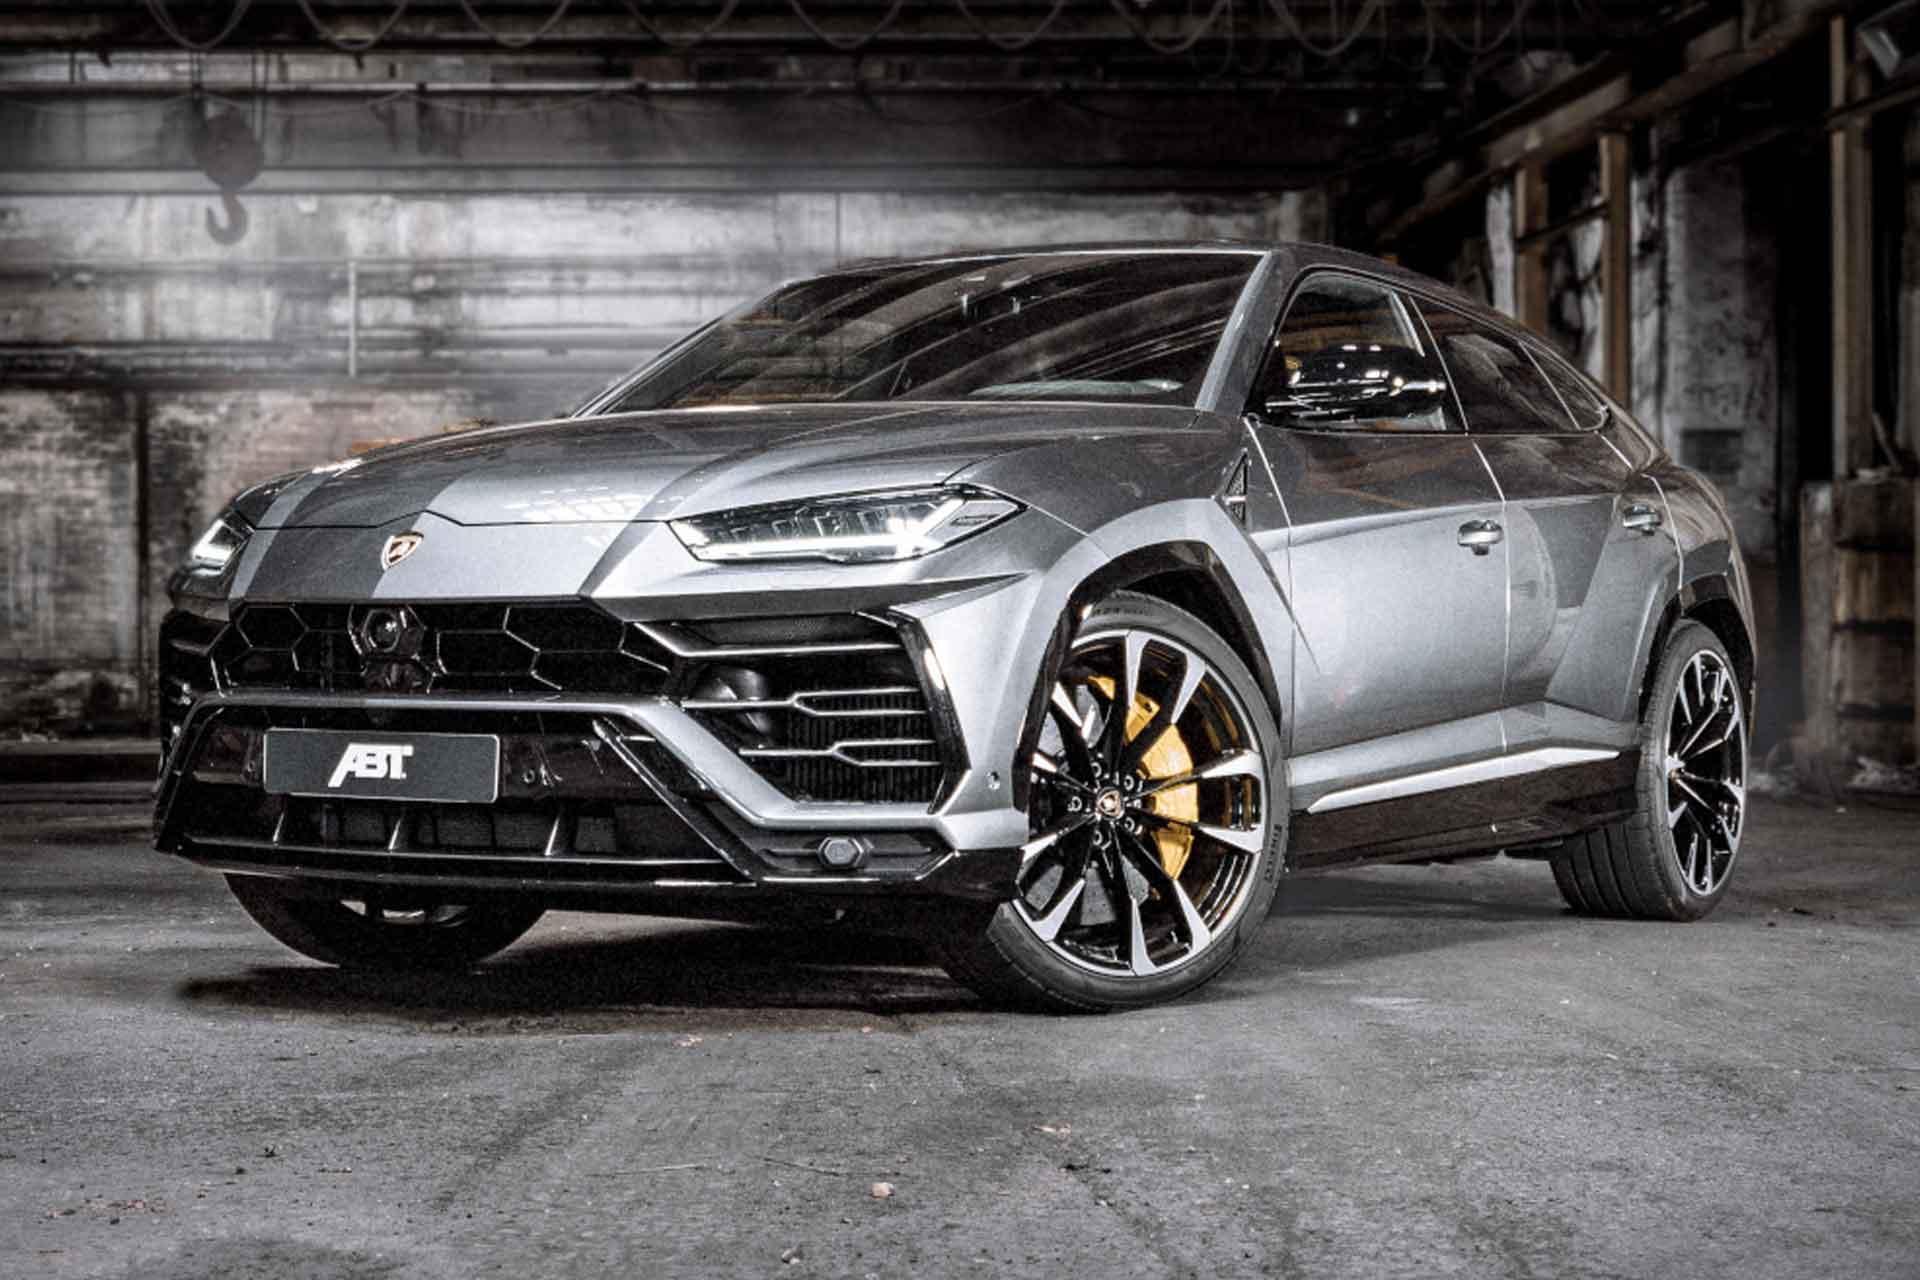 Lamborghini Urus 710-hp ABT Sportsline Upgrade